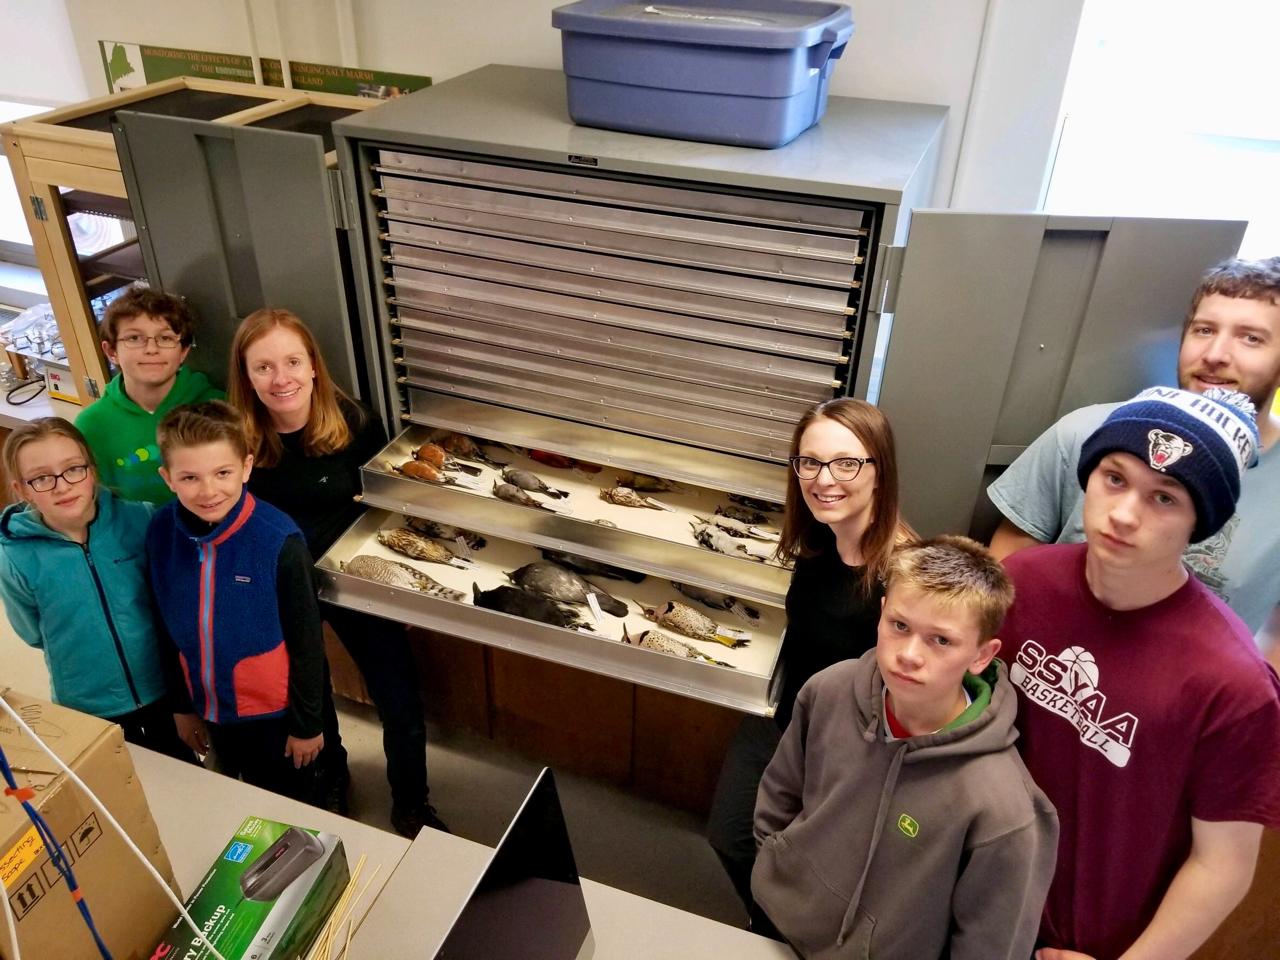 Checking out the bird museum specimens